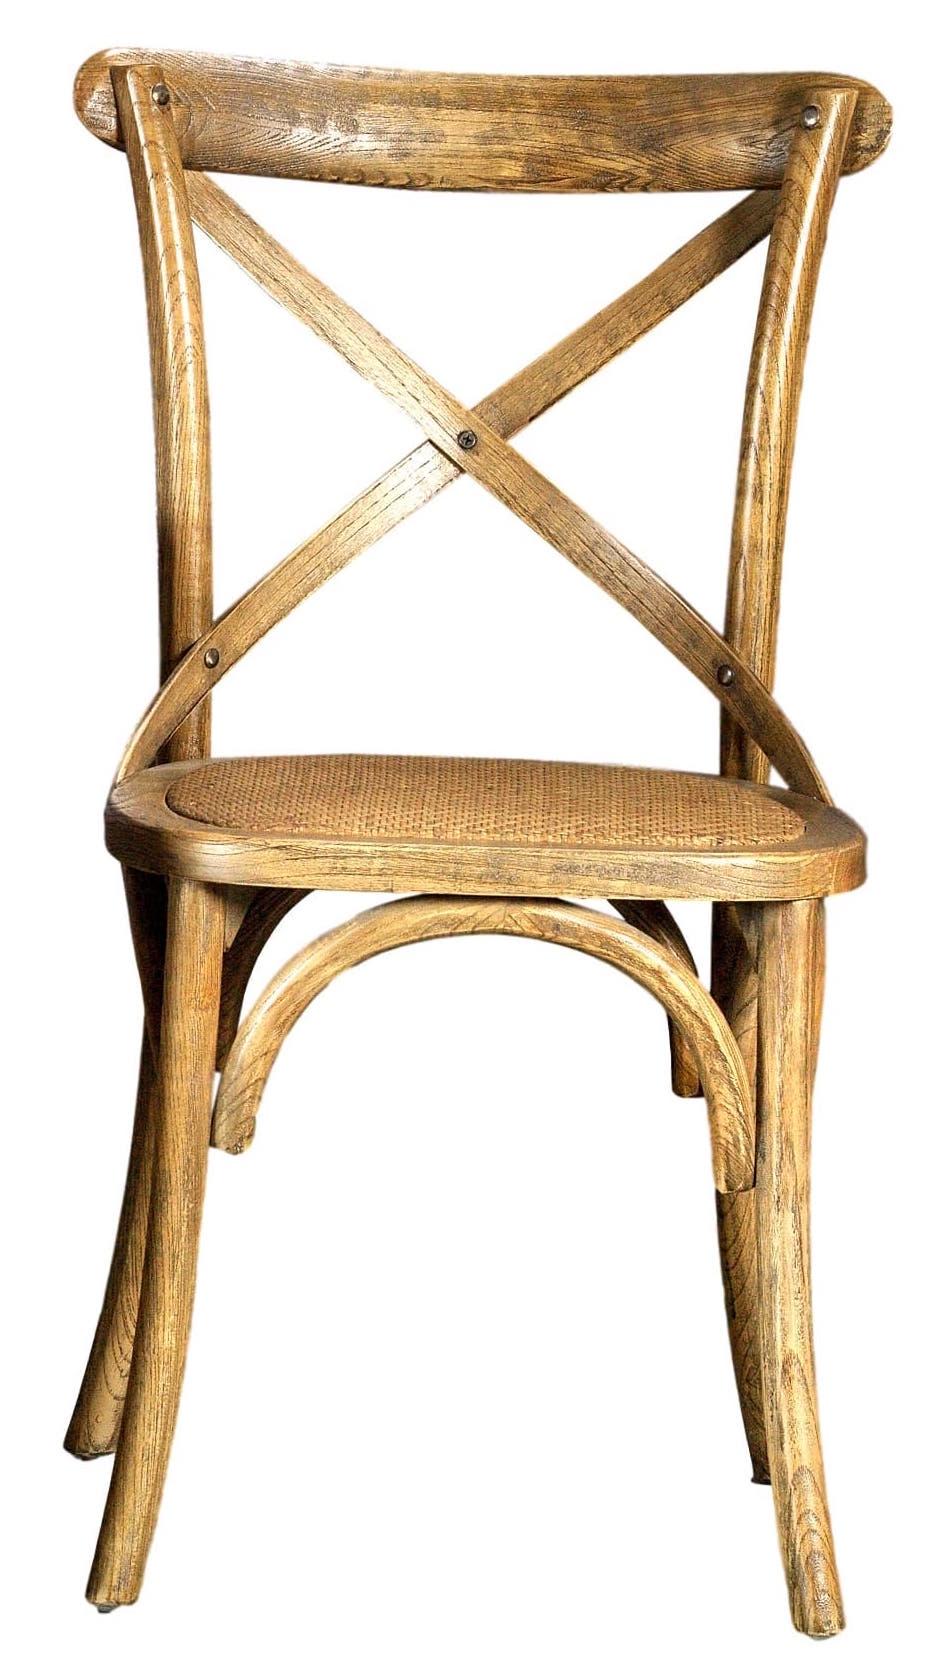 Sedia di legno con seduta imbottita in rattan naturale